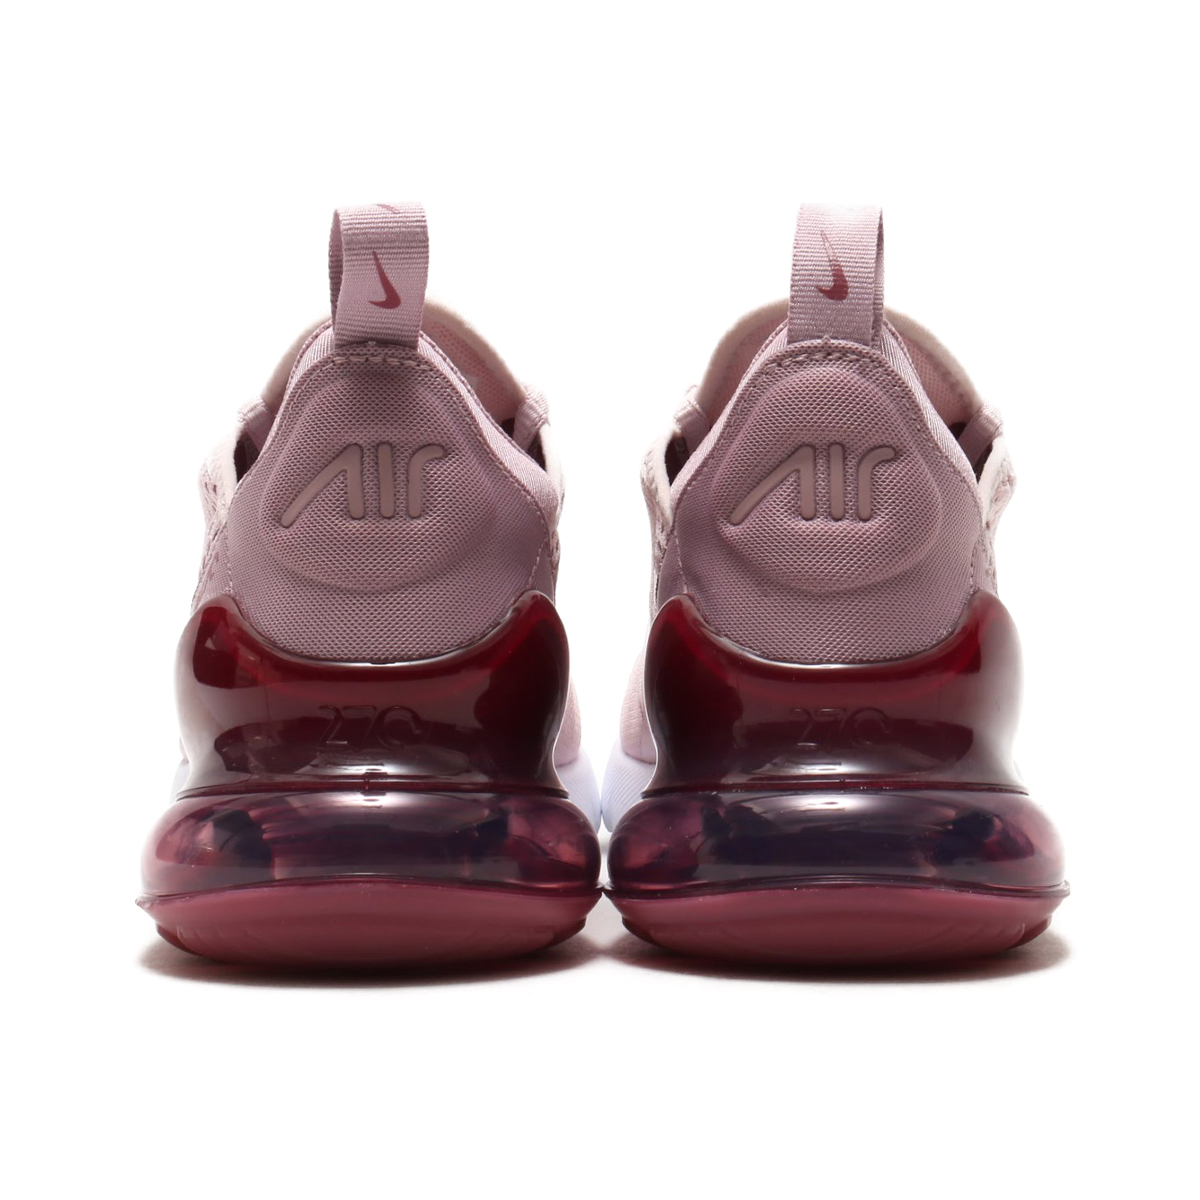 79f6765a59 atmos pink: NIKE W AIR MAX 270 (Nike women Air Max 270) (BARELY ROSE ...